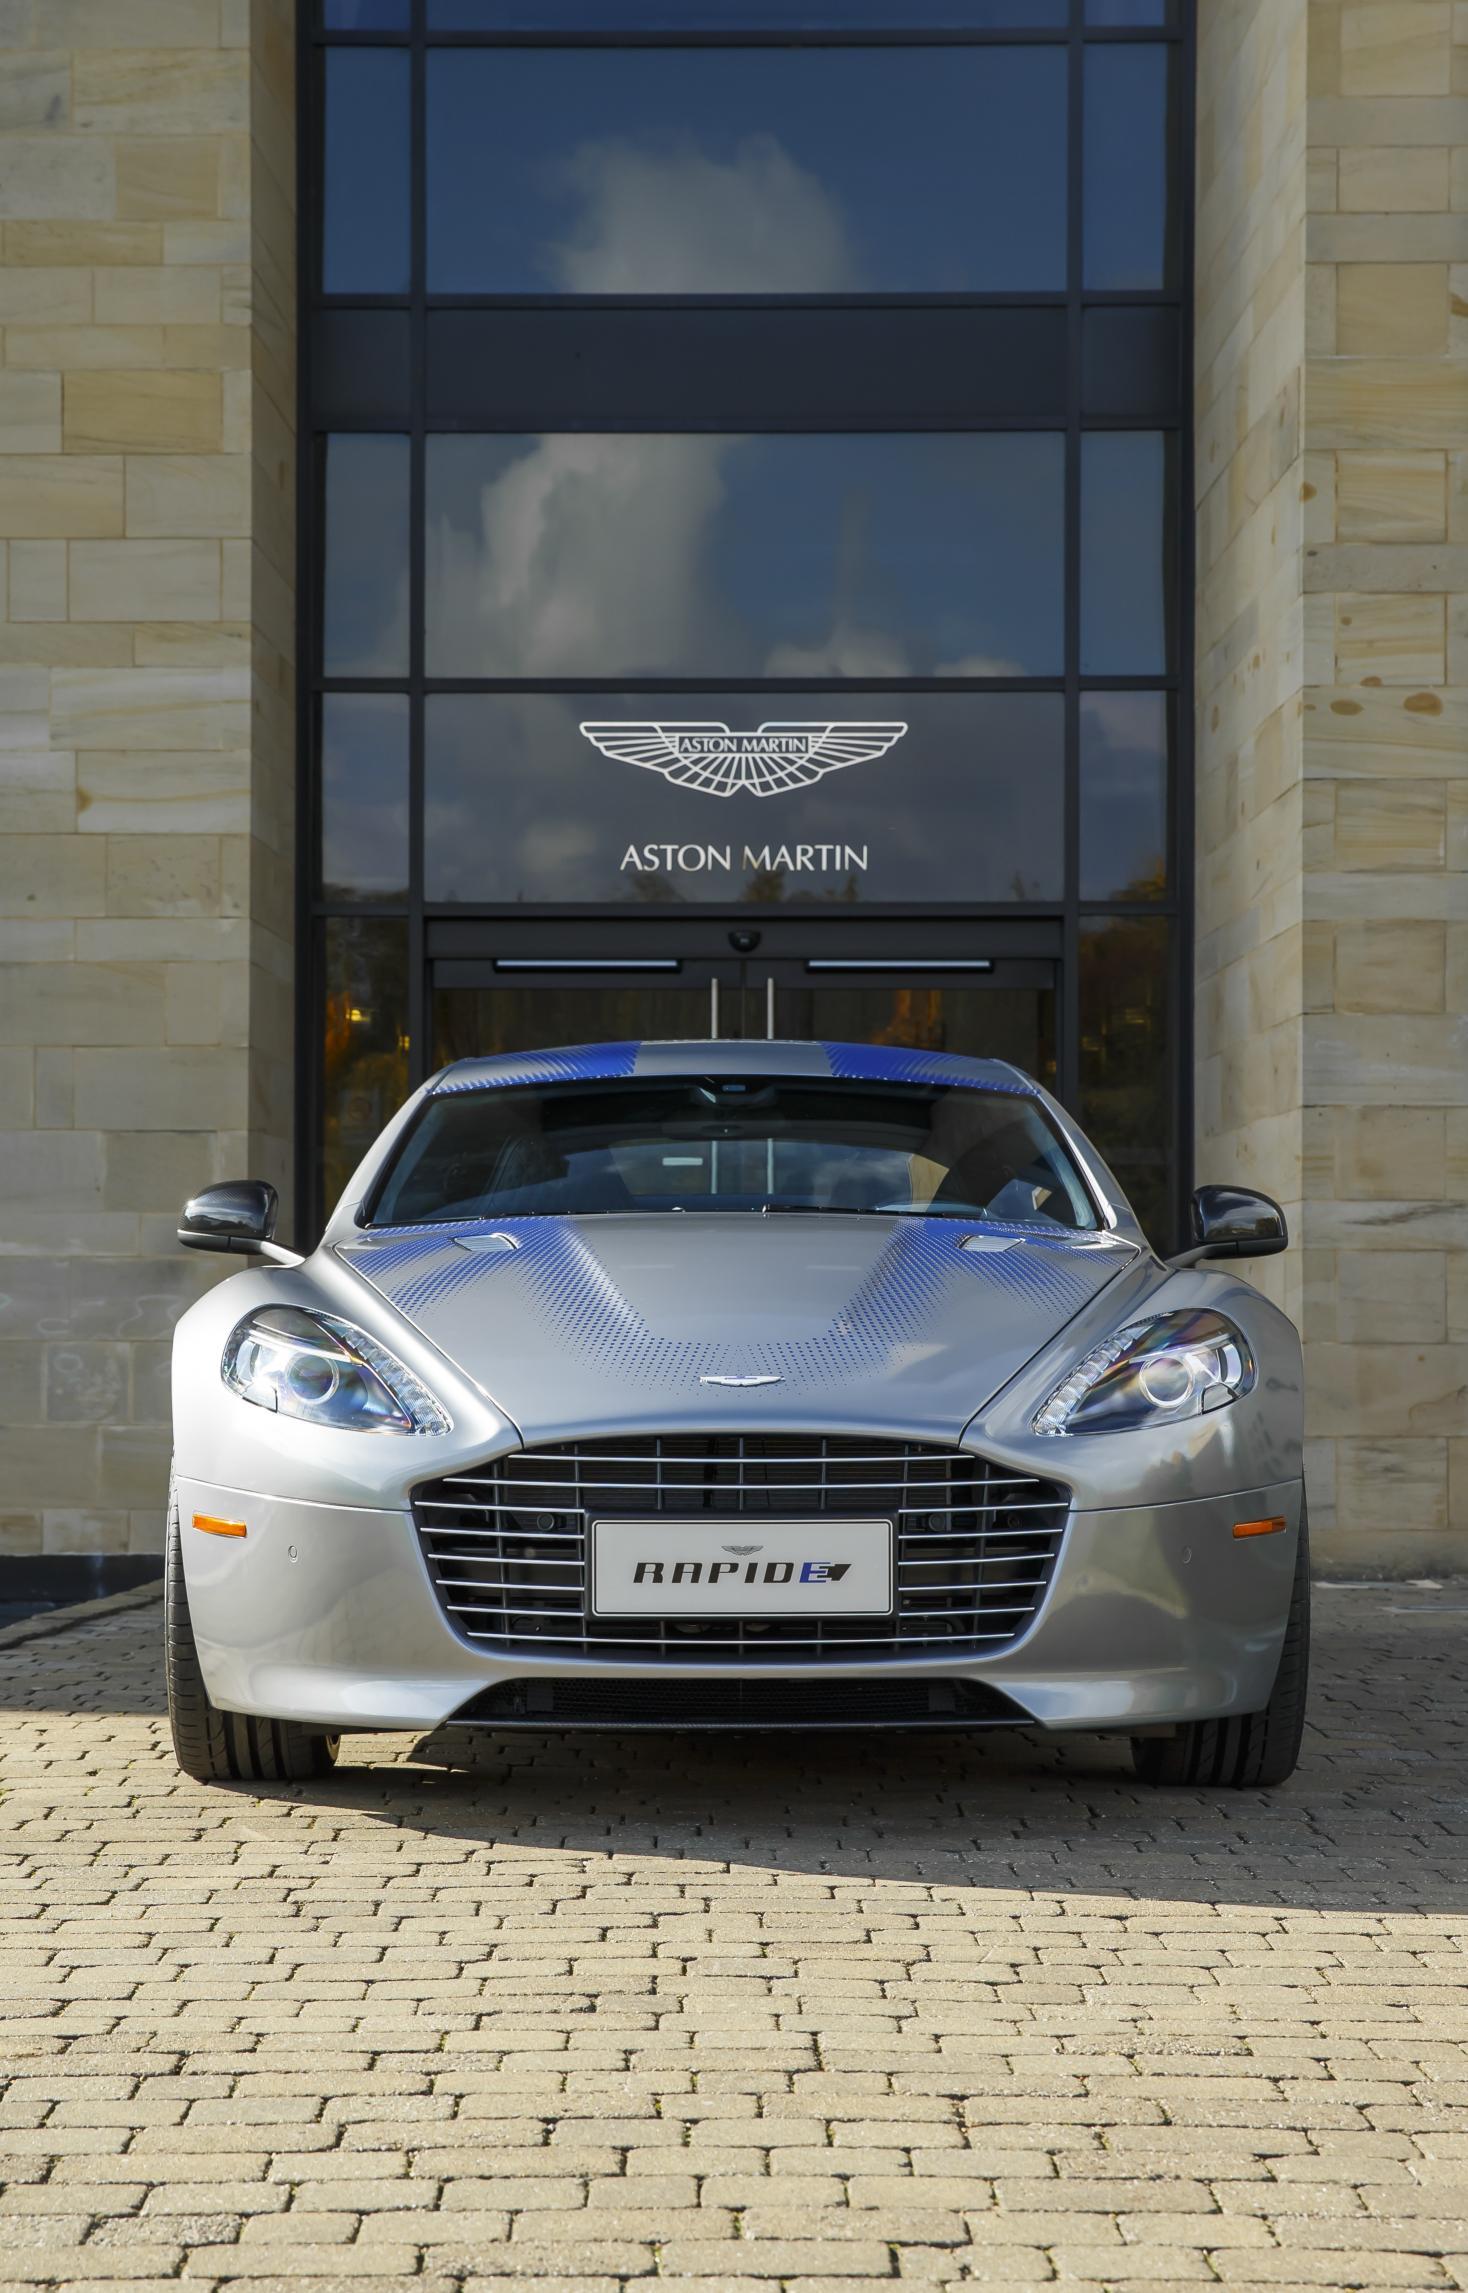 17 February 2016 Frankfurt Germany Leading Global Technology Company Leeco And Luxury Sports Car Brand Aston Martin Today Signed A Memorandum Of